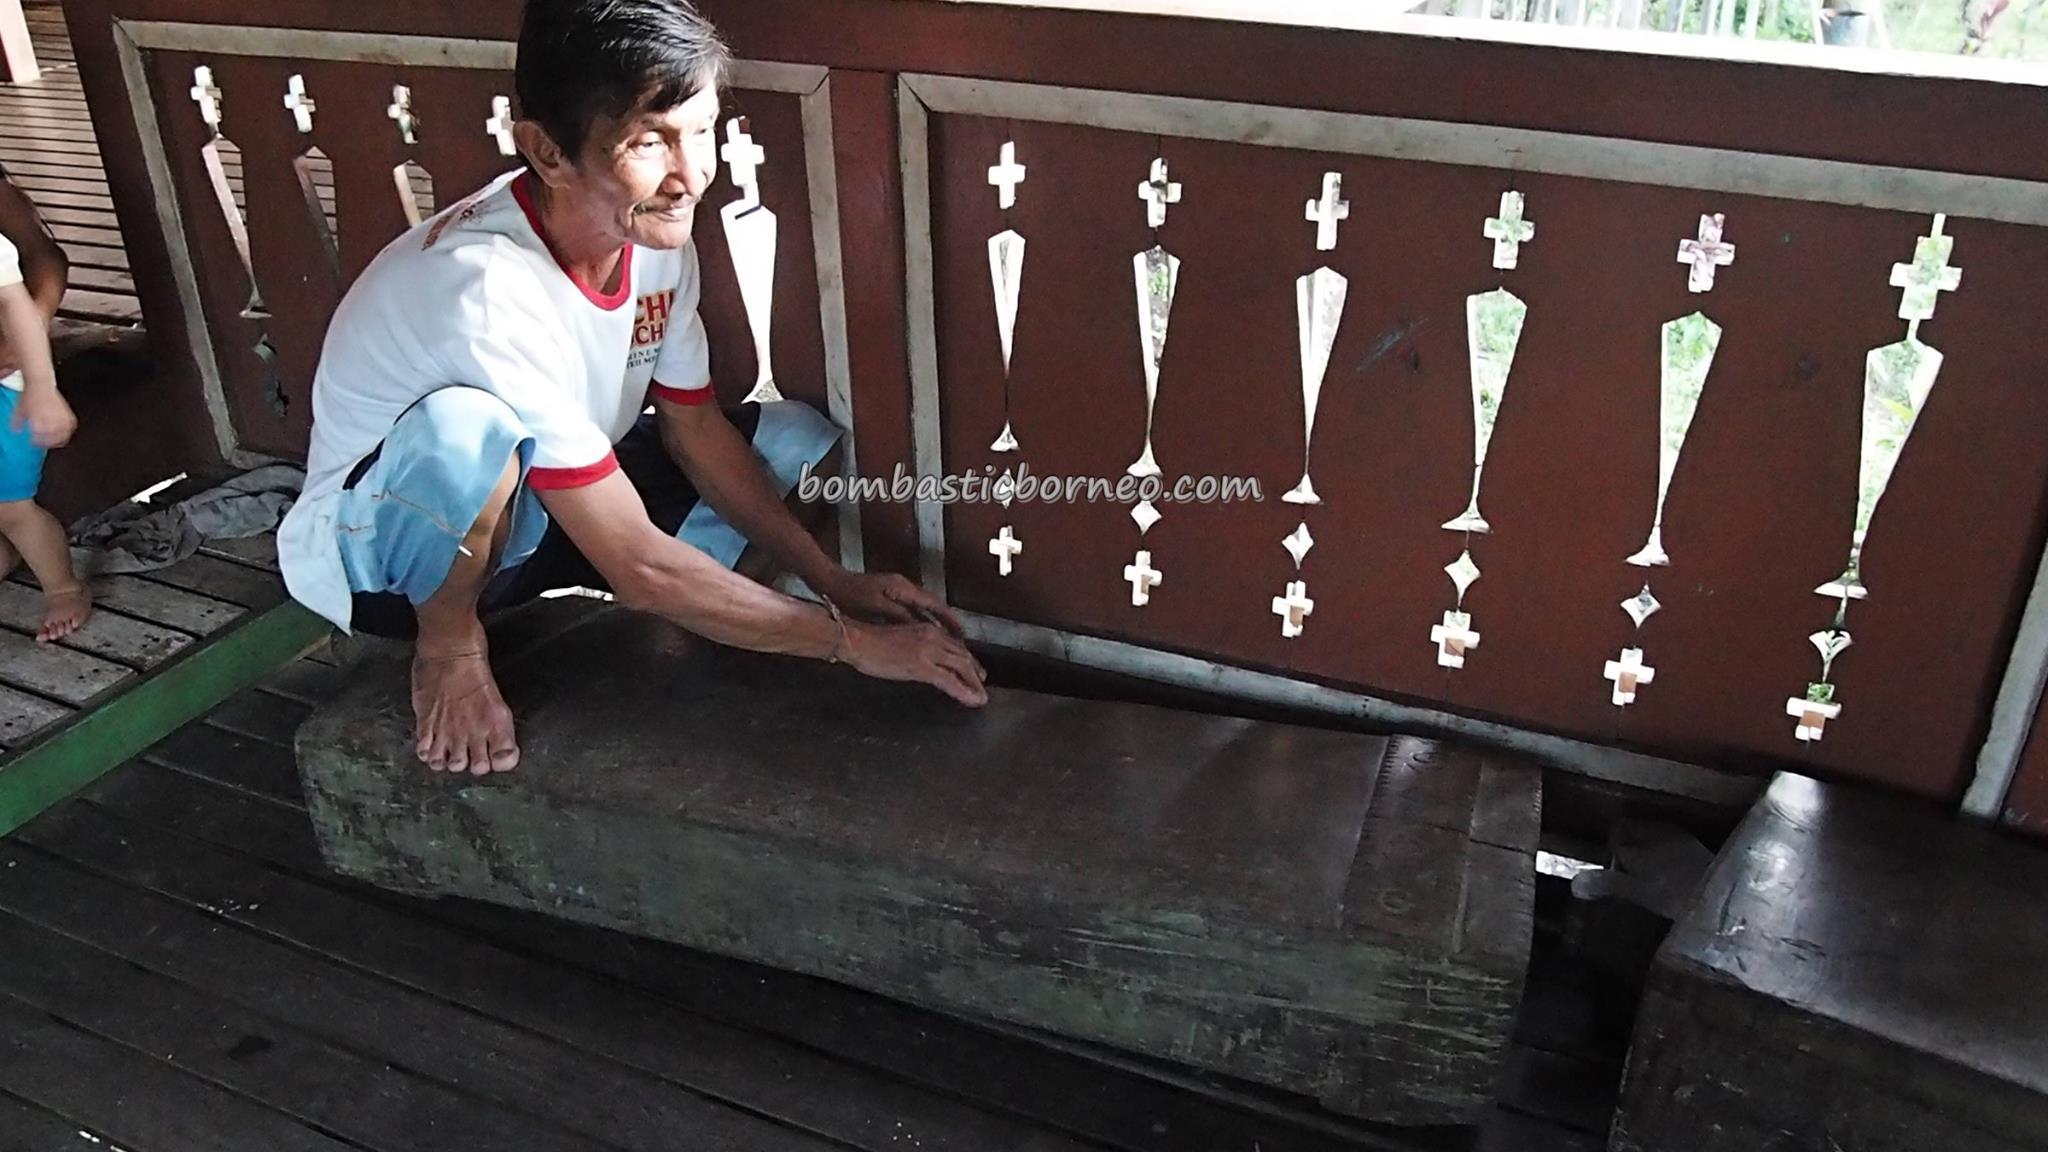 Rumah Betang Soo Limung, traditional, village, culture, Putussibau Selatan, Indonesia, West Kalimantan, Kapuas Hulu, Desa Melapi, Dusun Pabiring, tribe, tourist attraction, travel guide, 婆罗洲西加里曼丹, 旅游景点